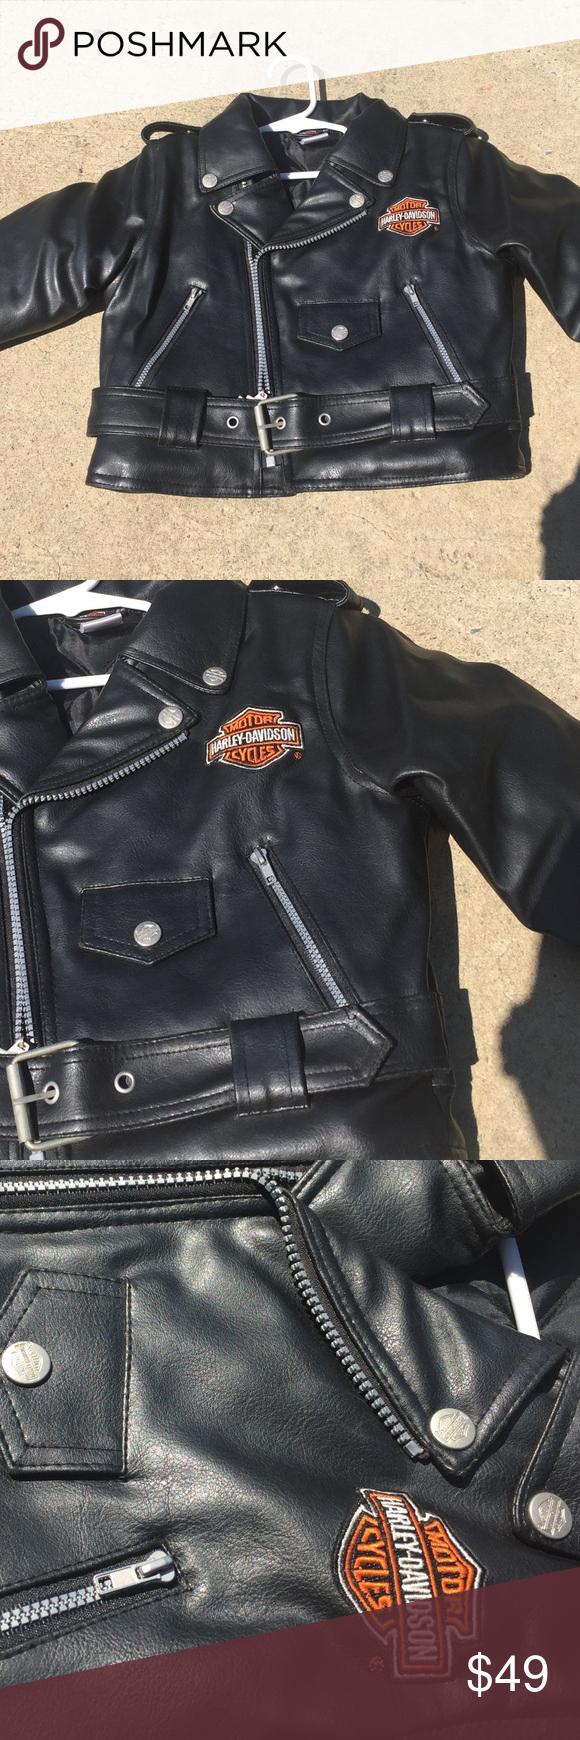 Harley Davidson 3t Leather Jacket Baby Biker Harley Savodson S Most Lovable Jacket The Toddlers Leather Leather Jacket Clothes Design Harley Davidson Jacket [ 1740 x 580 Pixel ]